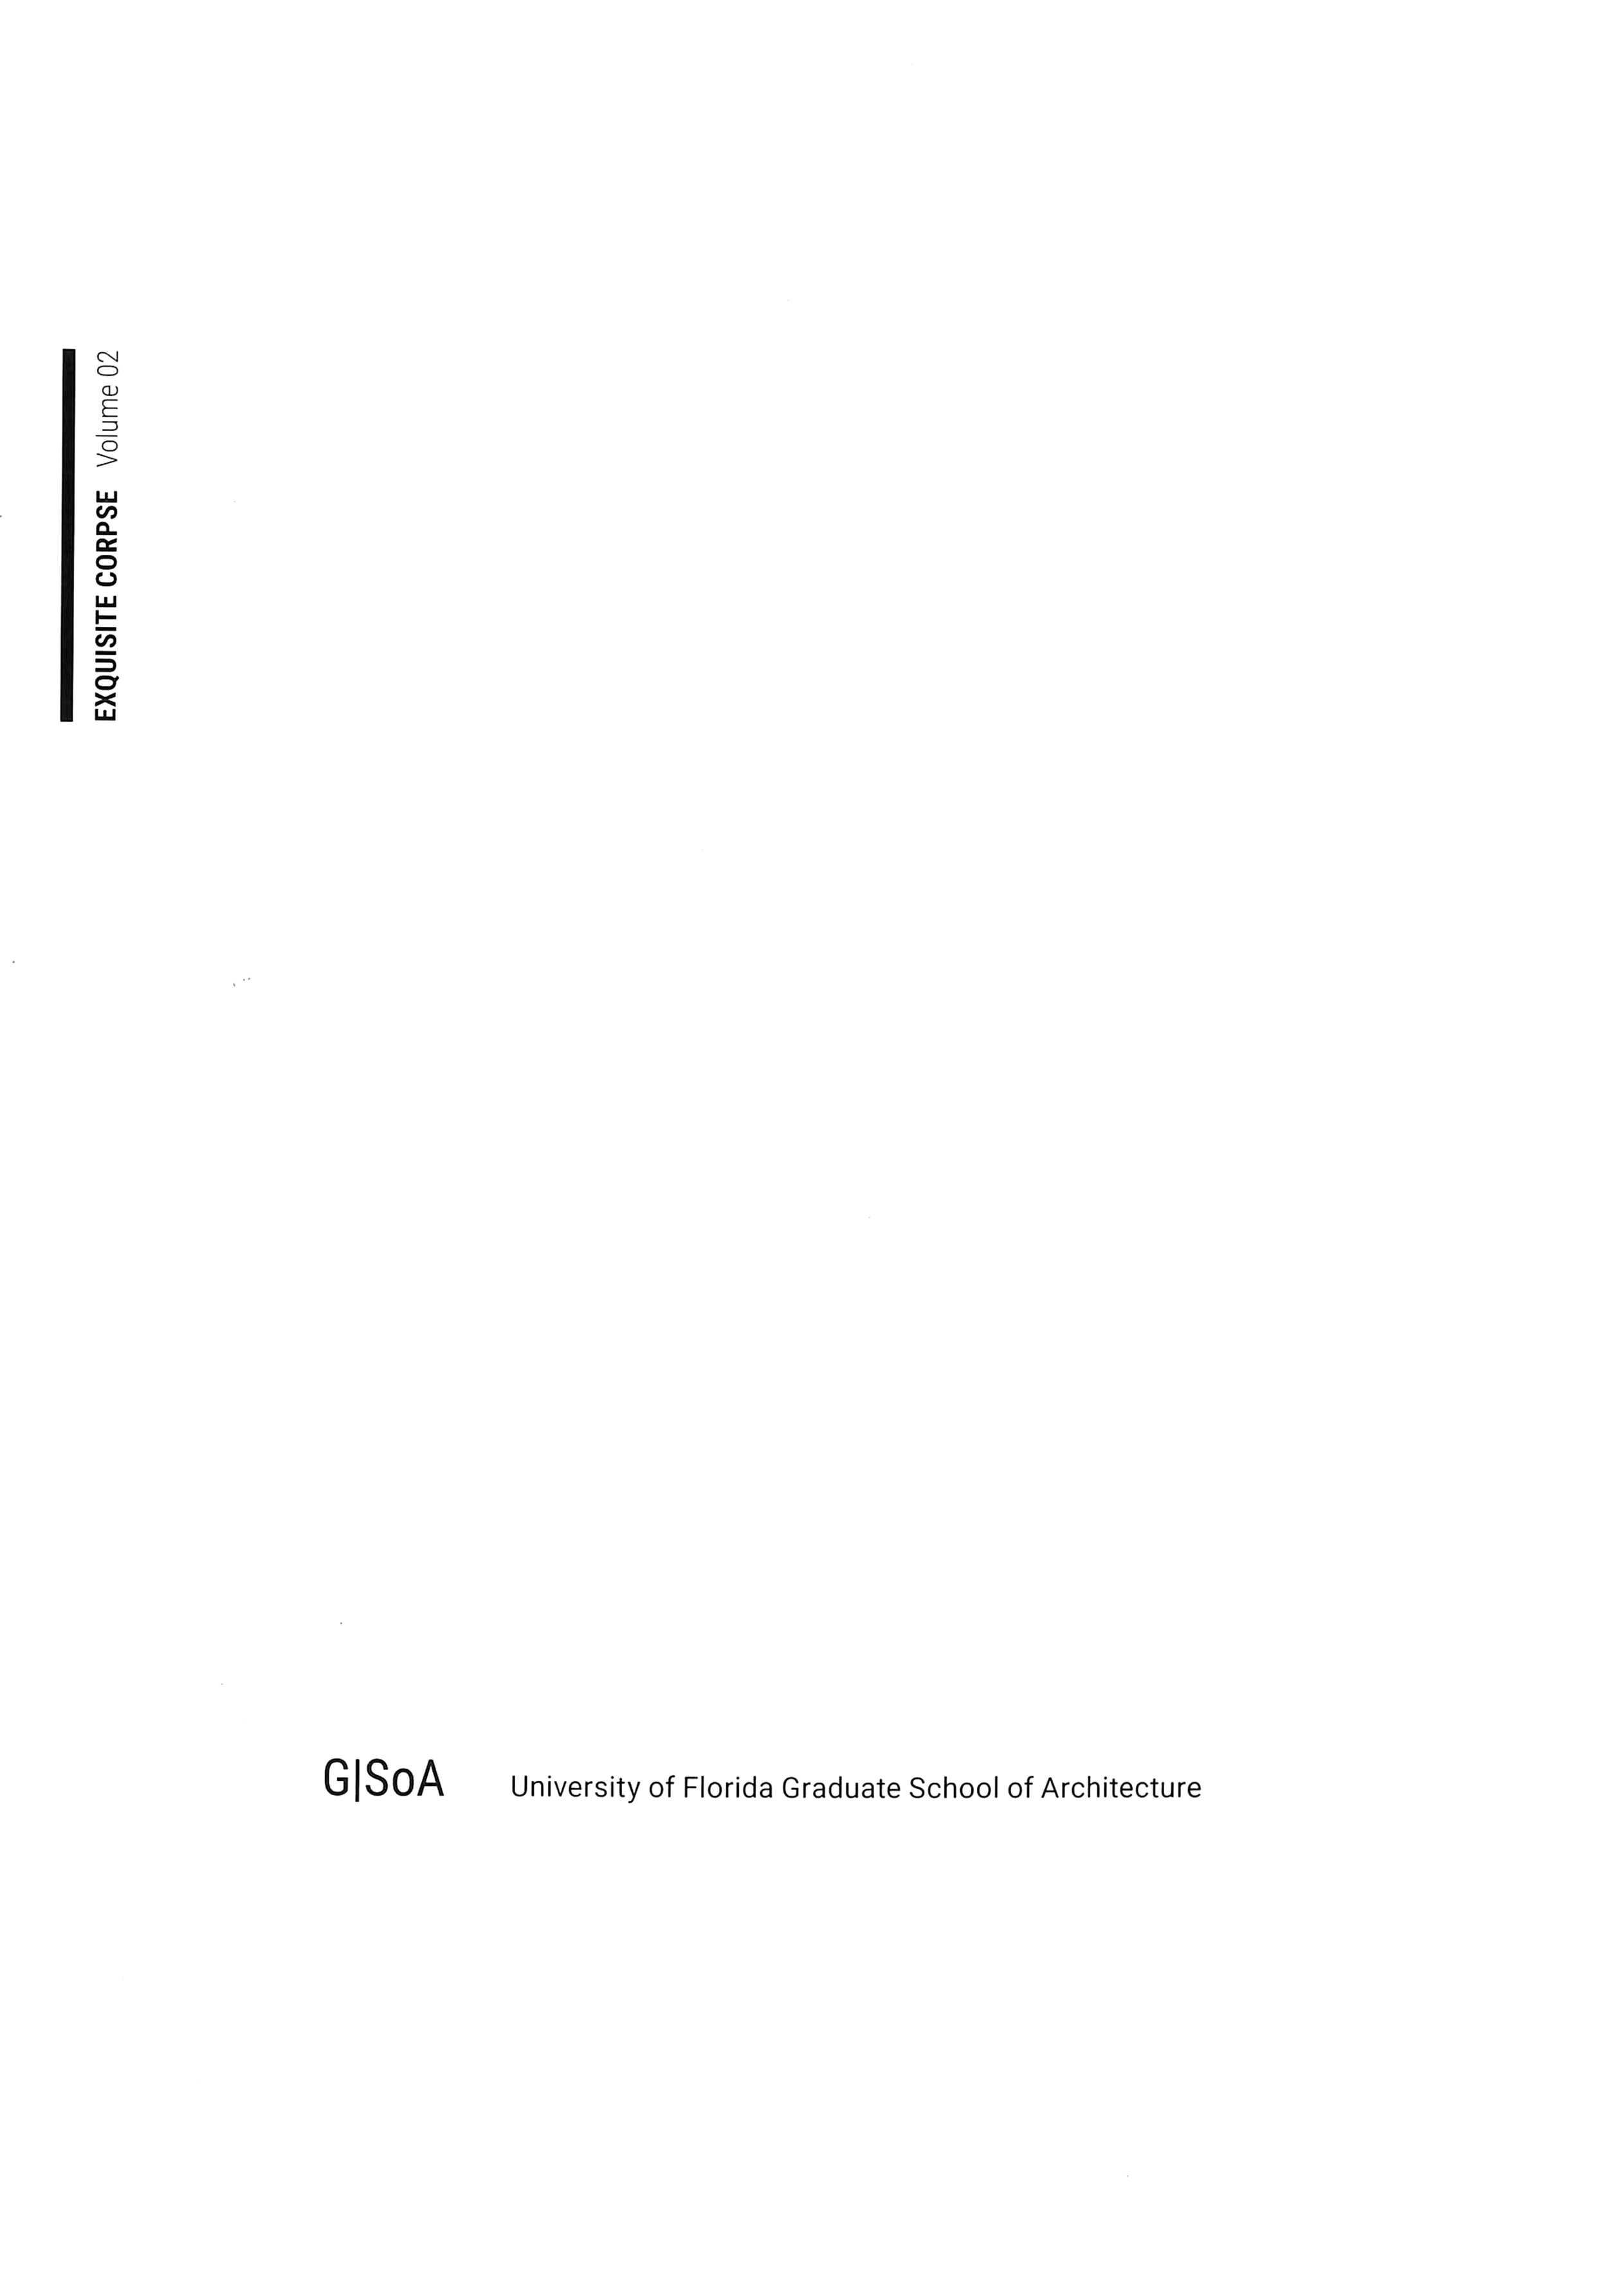 Vorkurs_Exquisite Corpse_Volume 02, University of Florida GSOA, 2018_page 100.jpg